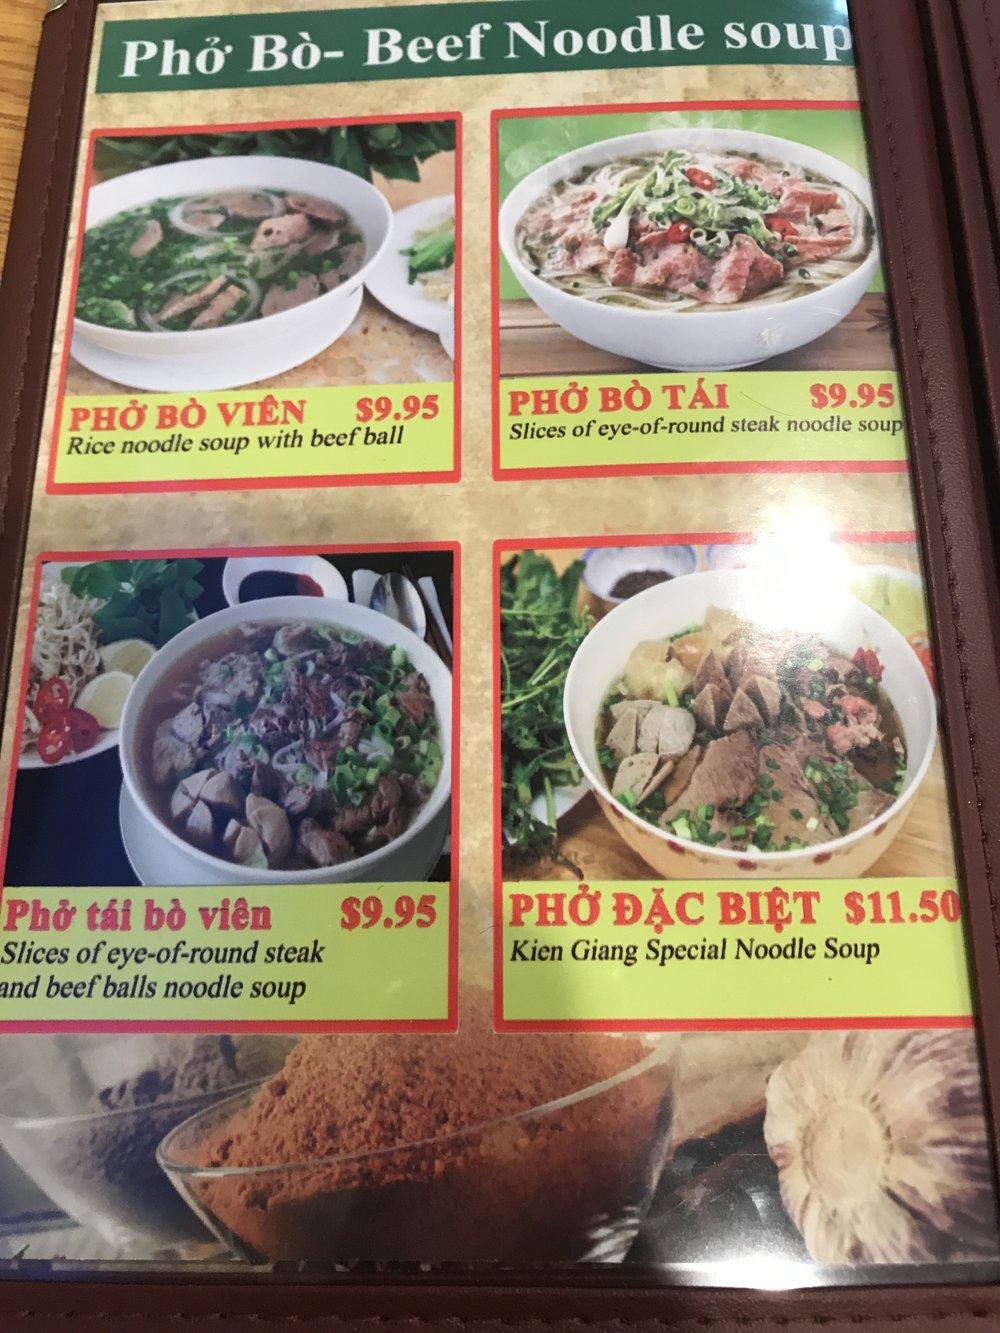 Kien Giang Quan's Beef Noodle Menu